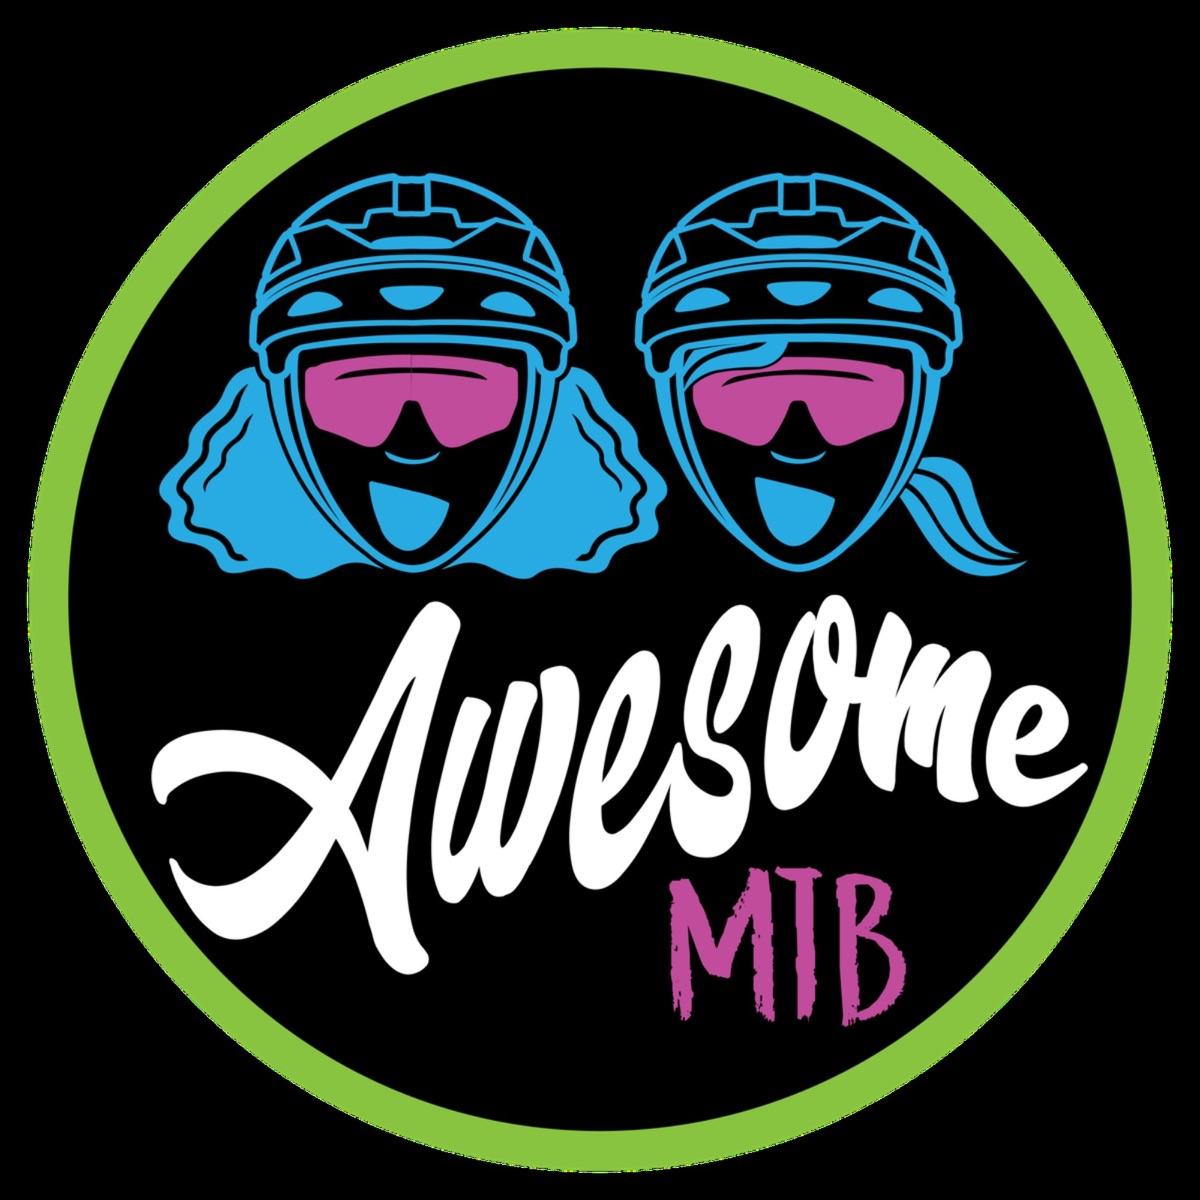 Awesome MTB